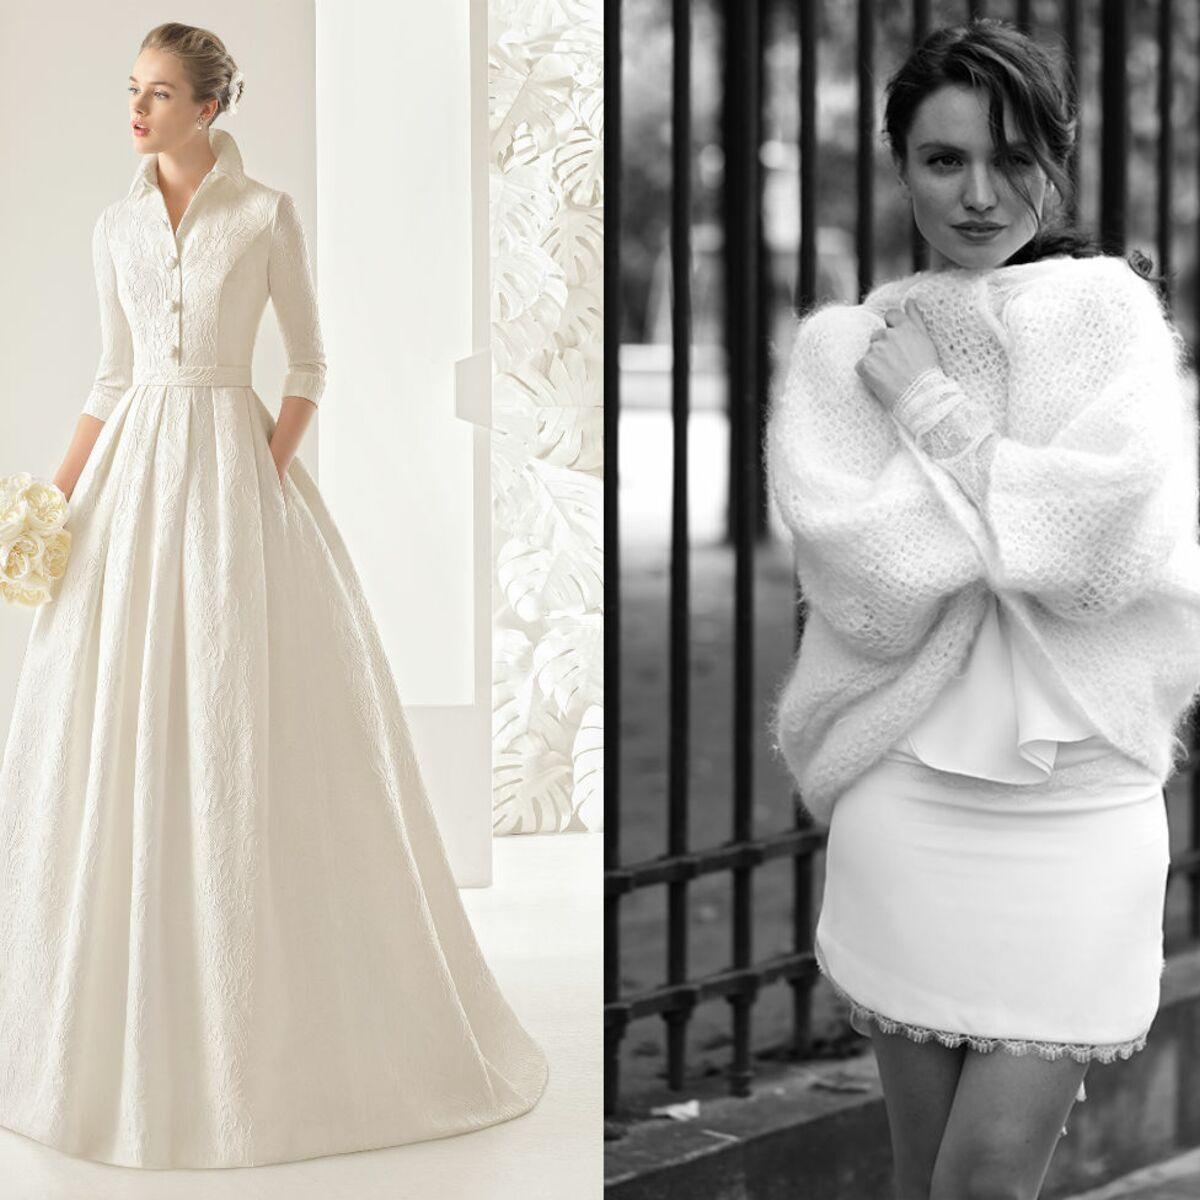 PHOTOS - Mariage d'hiver : 35 robes de marié